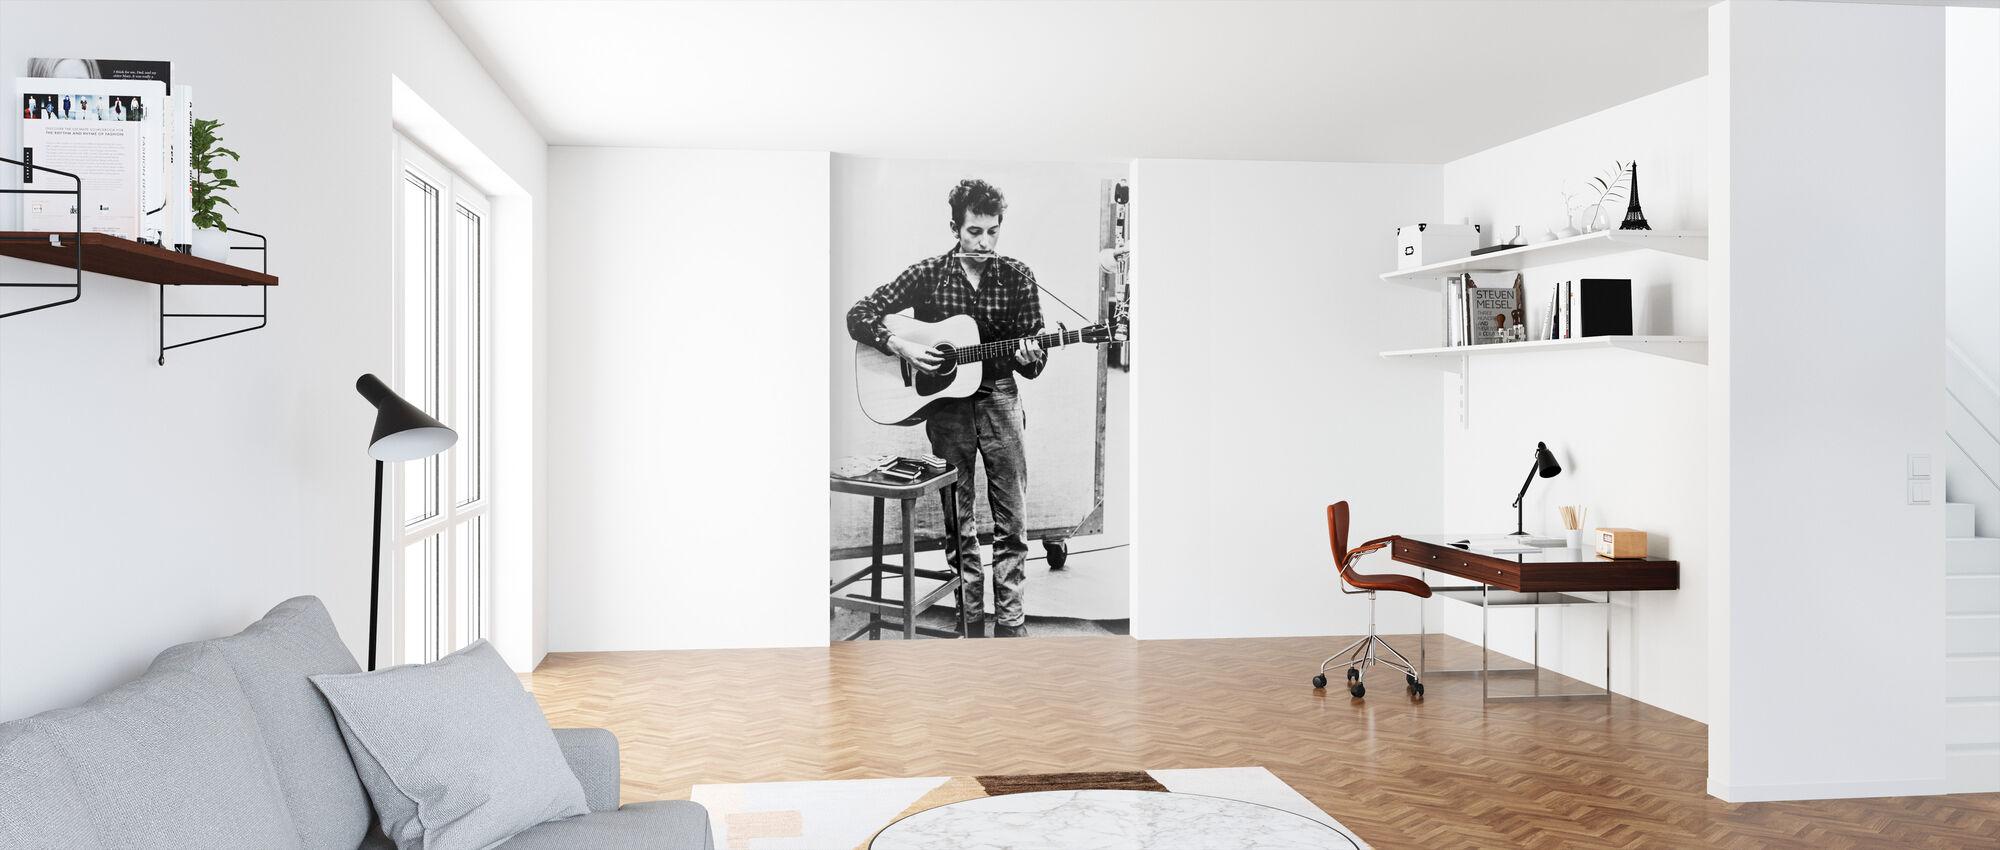 Mr Tambourine Man - Wallpaper - Office